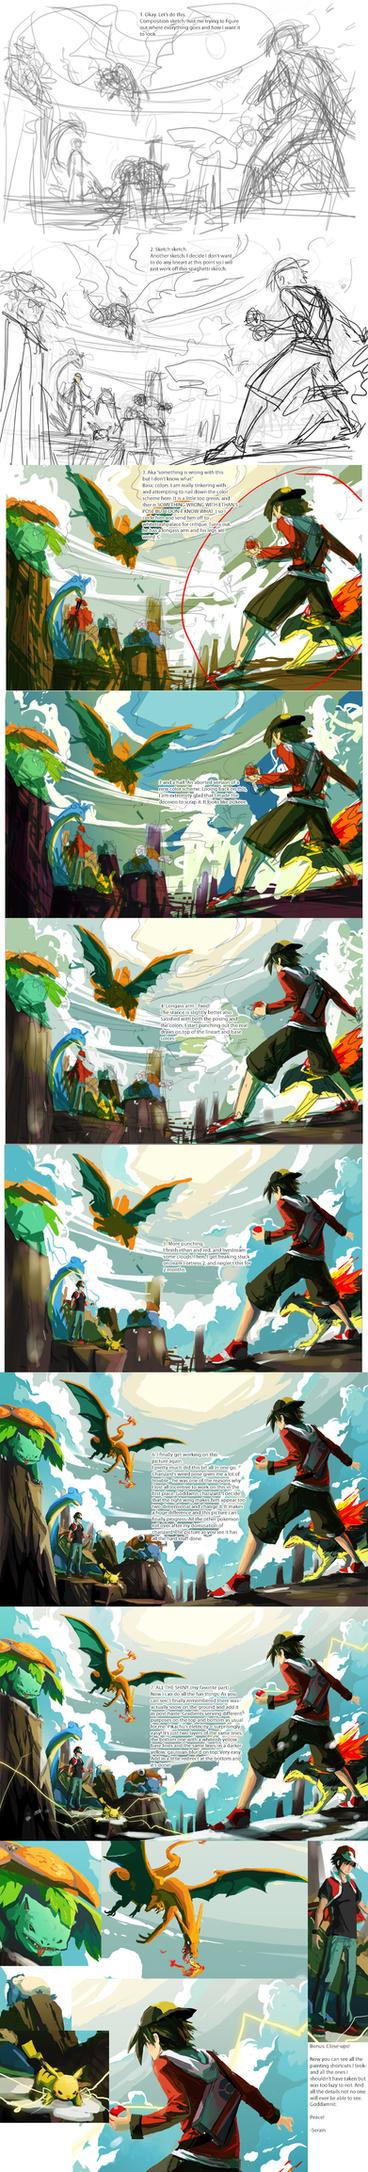 Battle on Mt. Silver Making Of by Serain